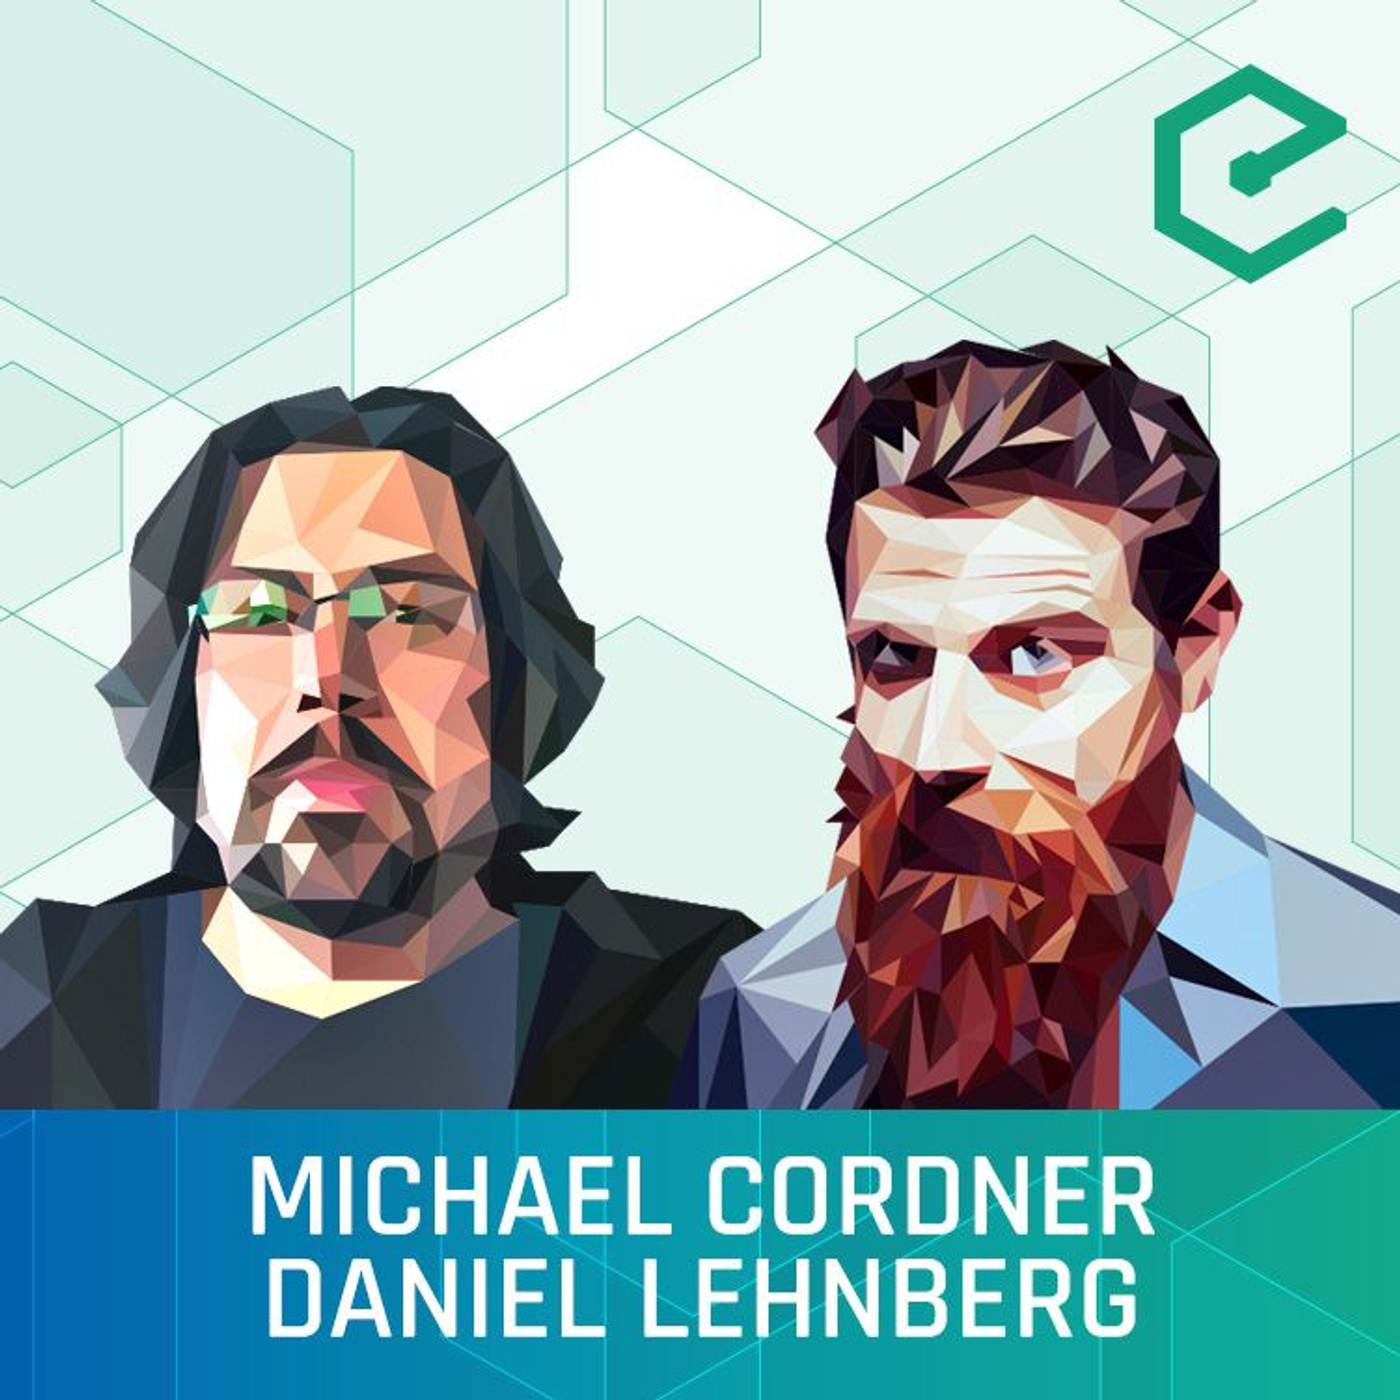 Daniel Lehnberg & Michael Cordner: Grin – Cypherpunk Mimblewimble